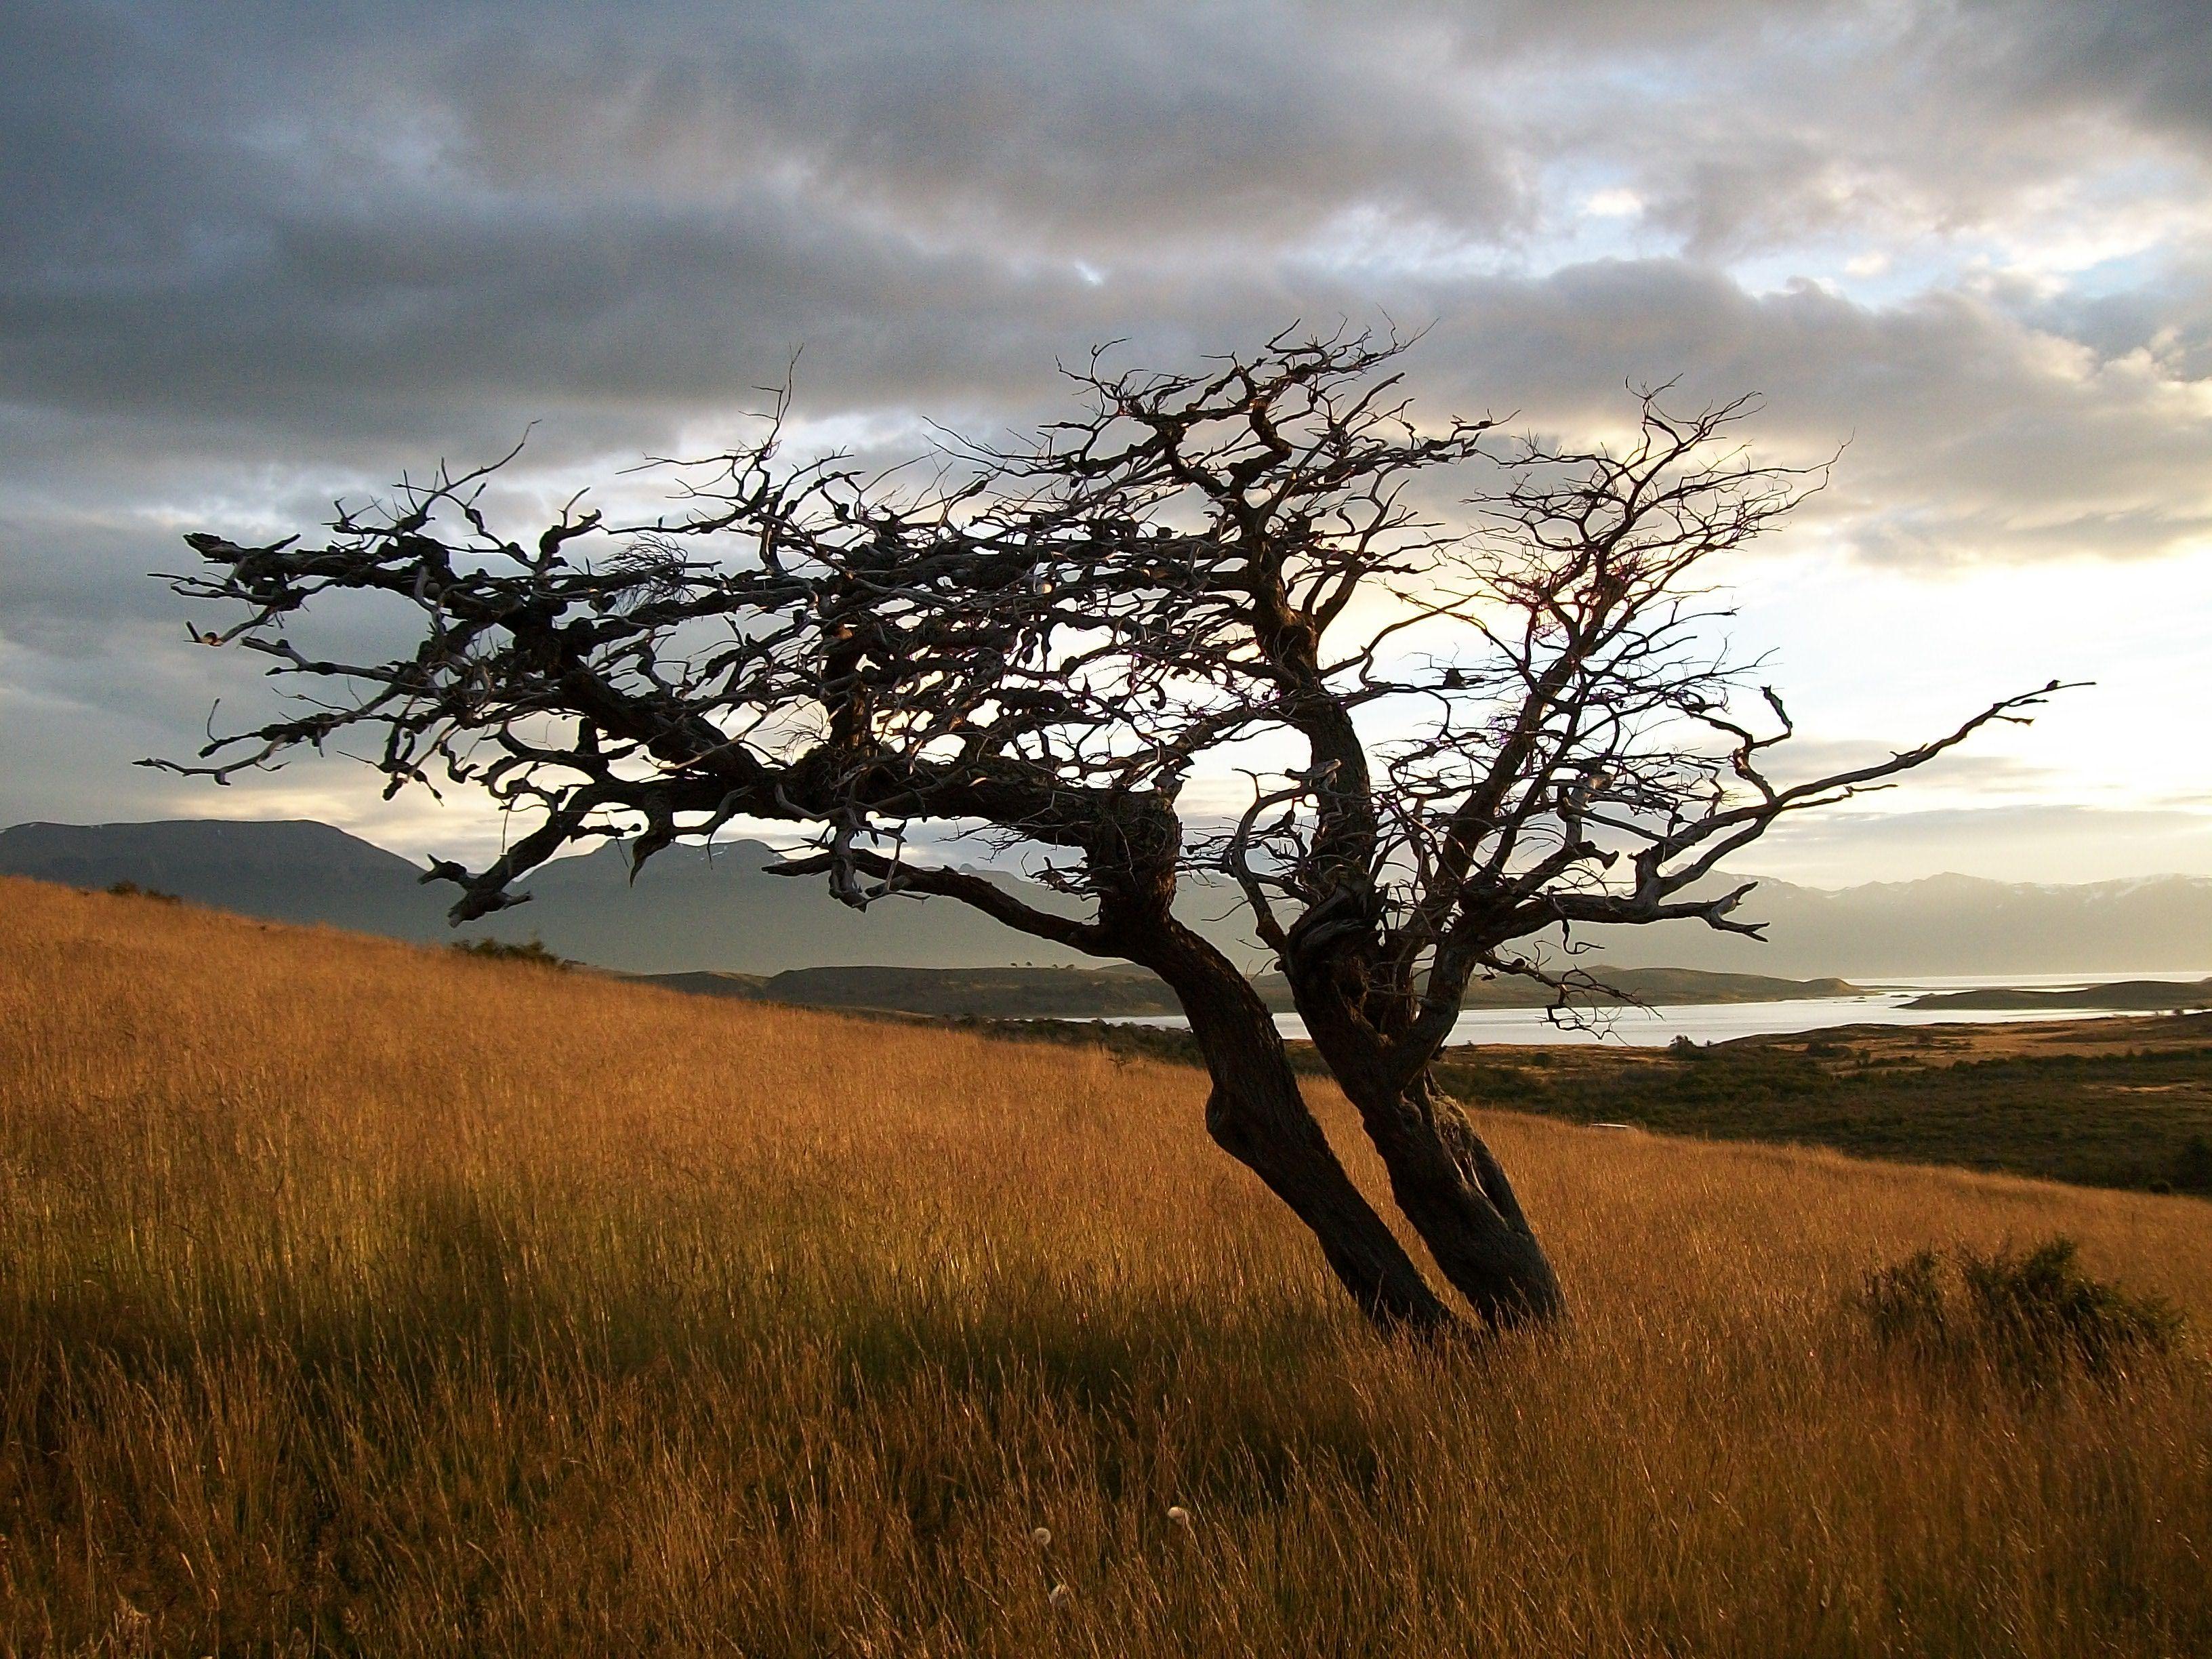 arboles de la patagonia에 대한 이미지 검색결과